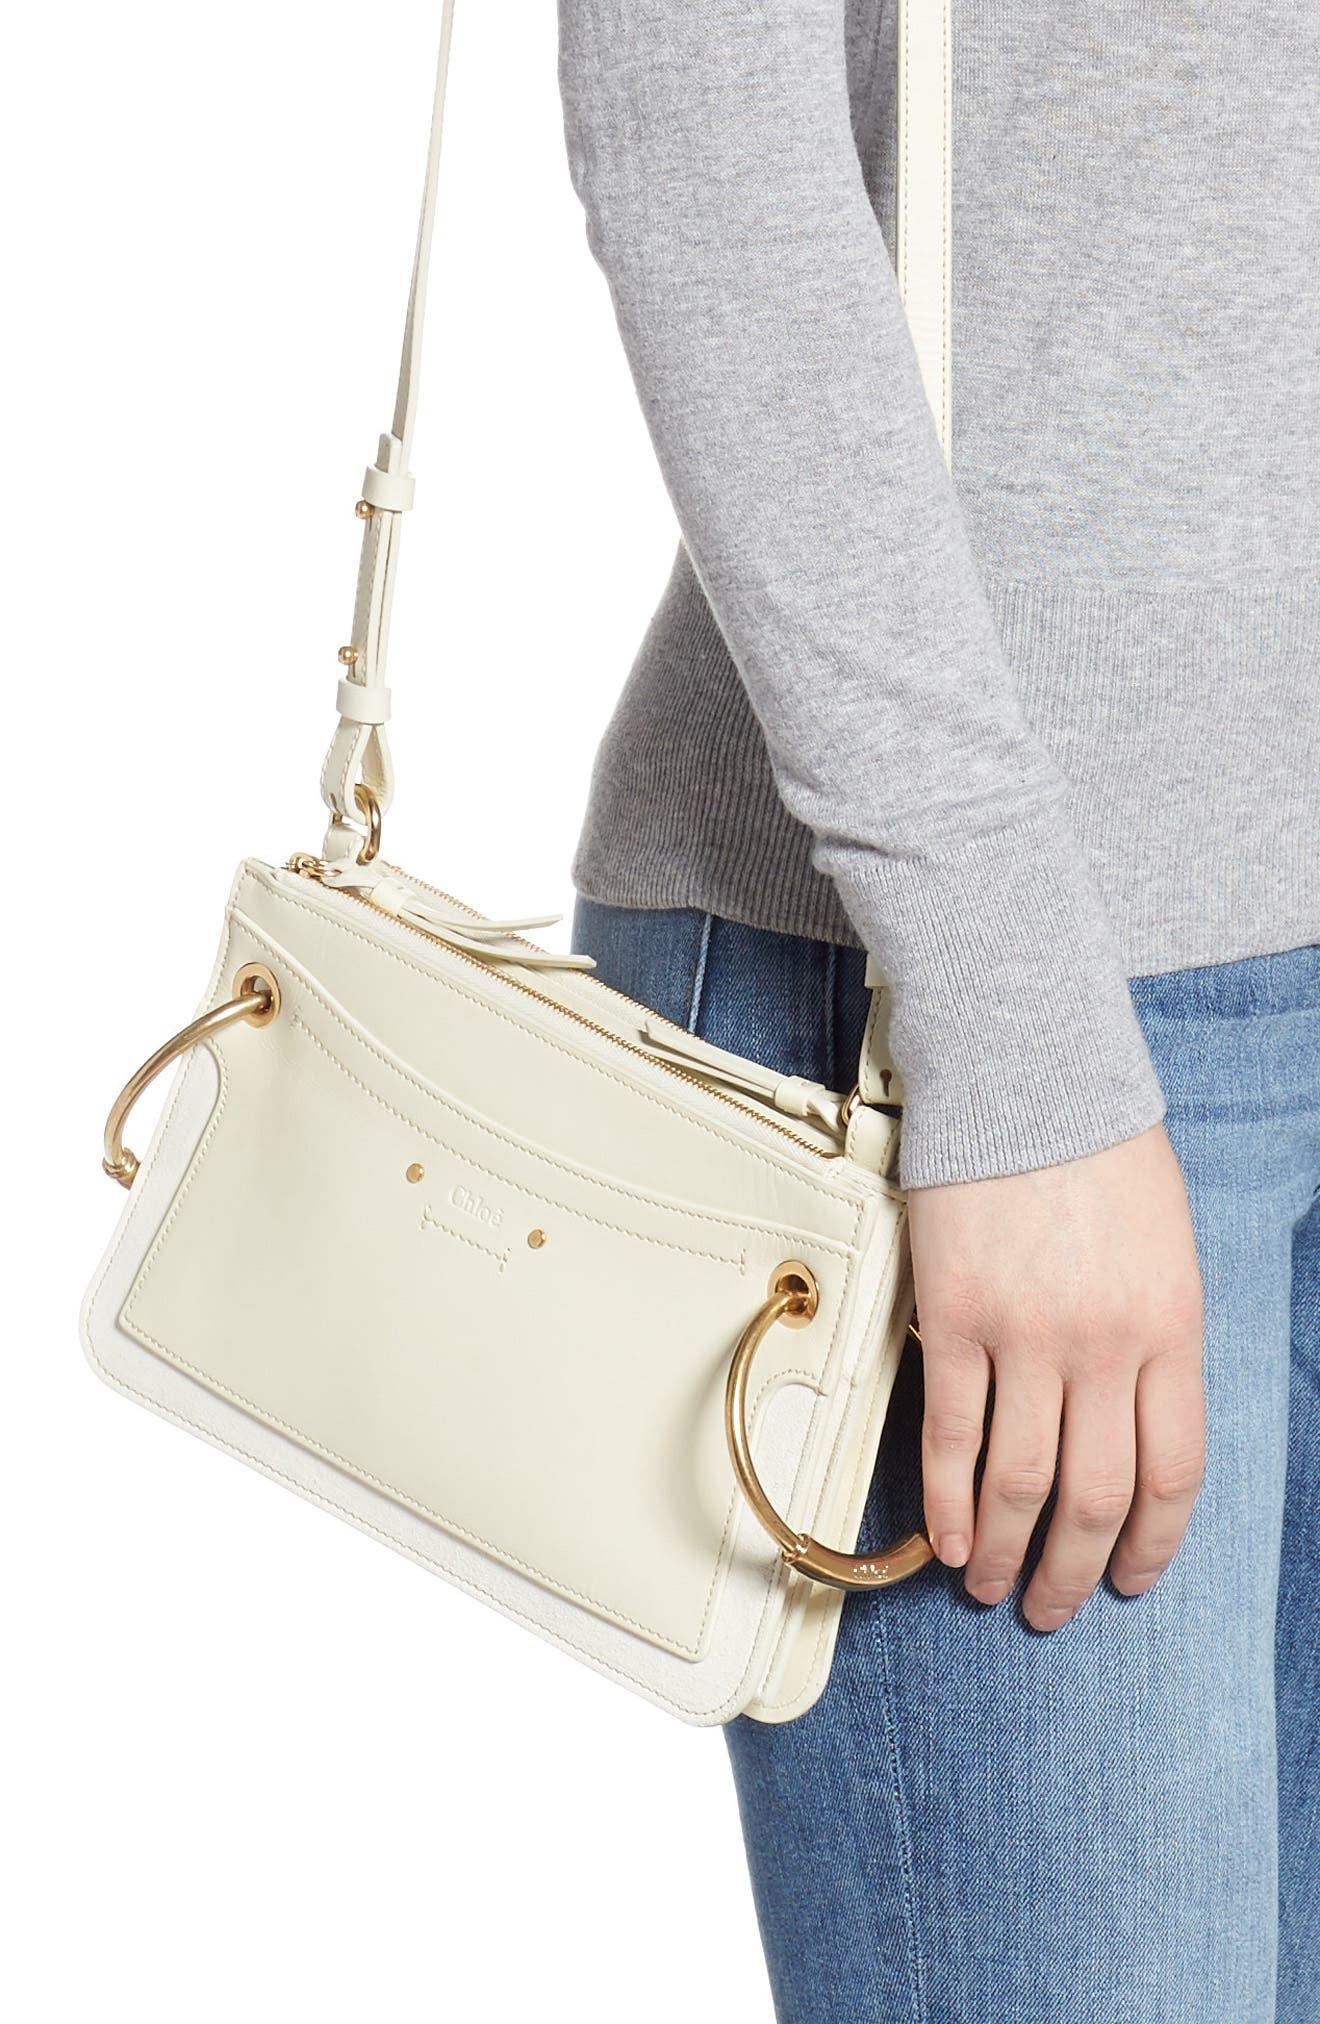 CHLOÉ,                             Small Roy Leather Shoulder Bag,                             Alternate thumbnail 2, color,                             NATURAL WHITE